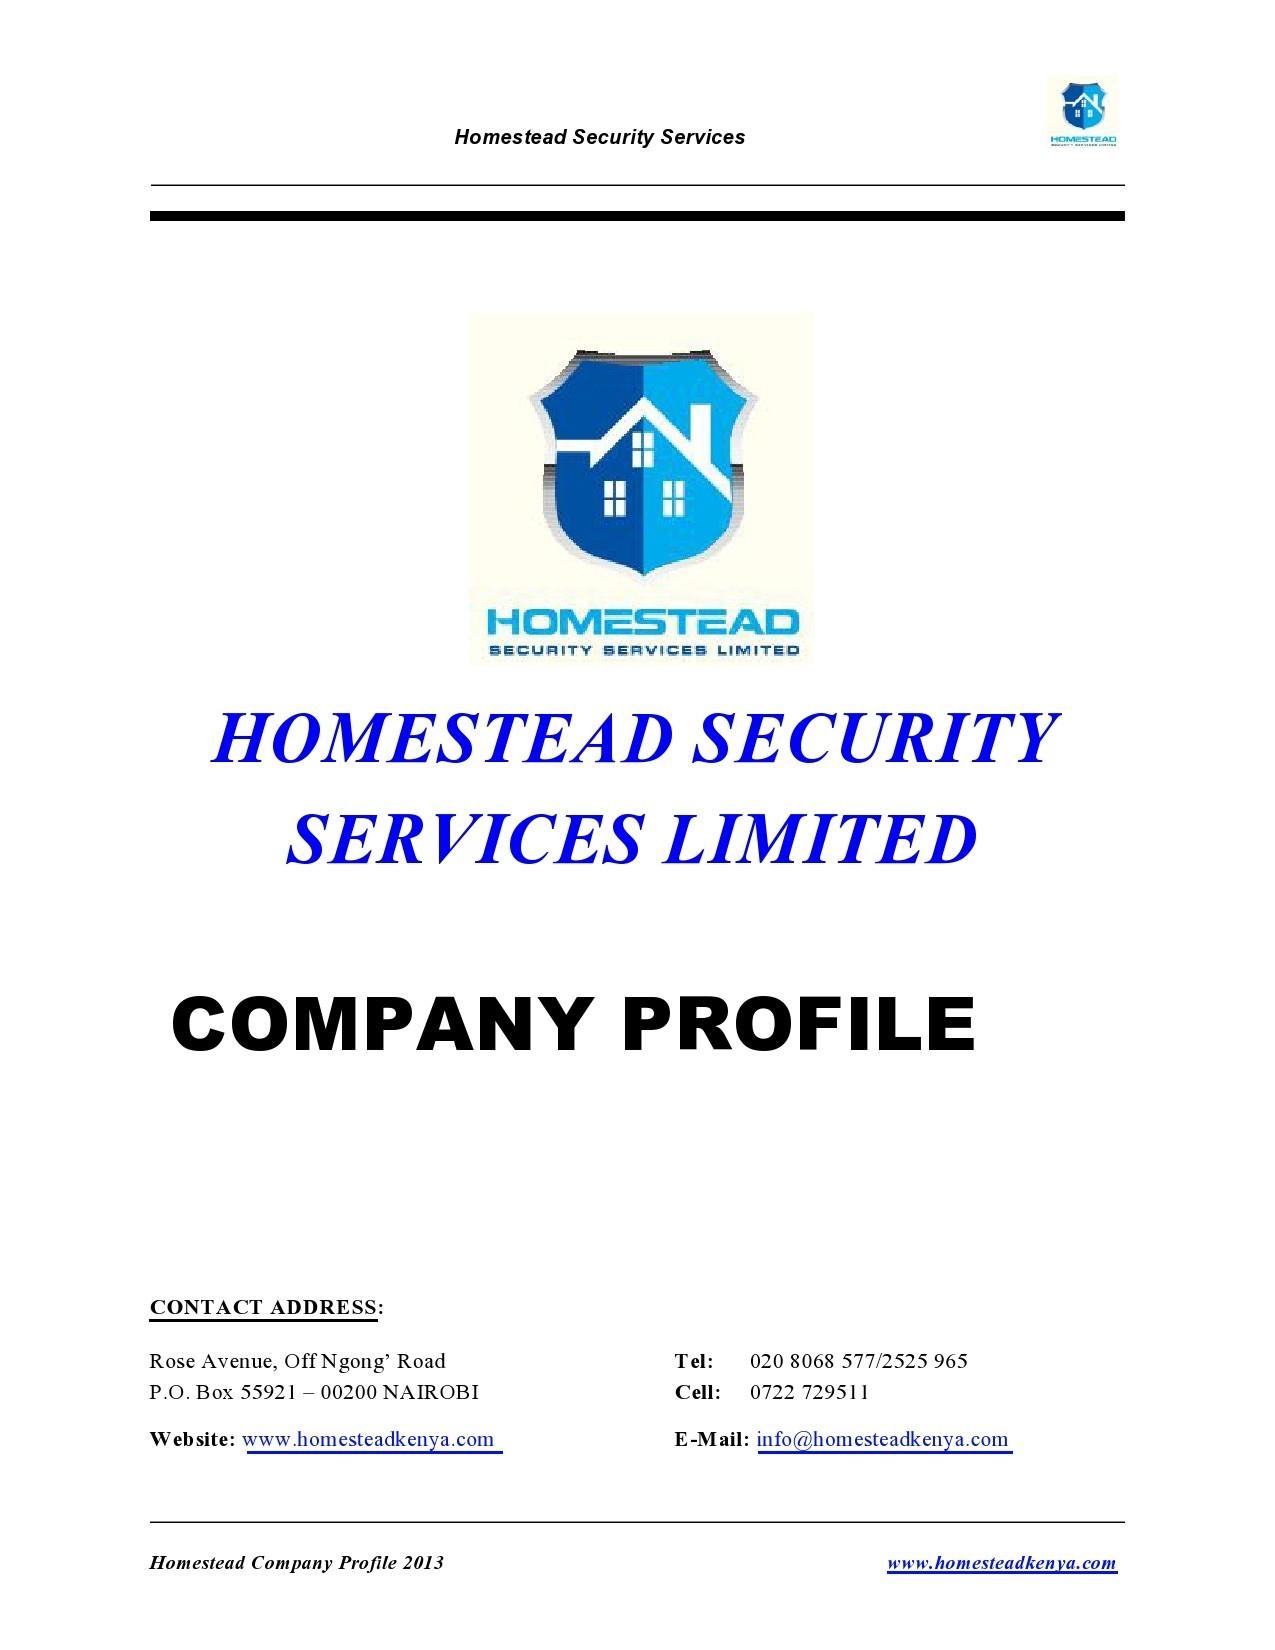 Free company profile template 09